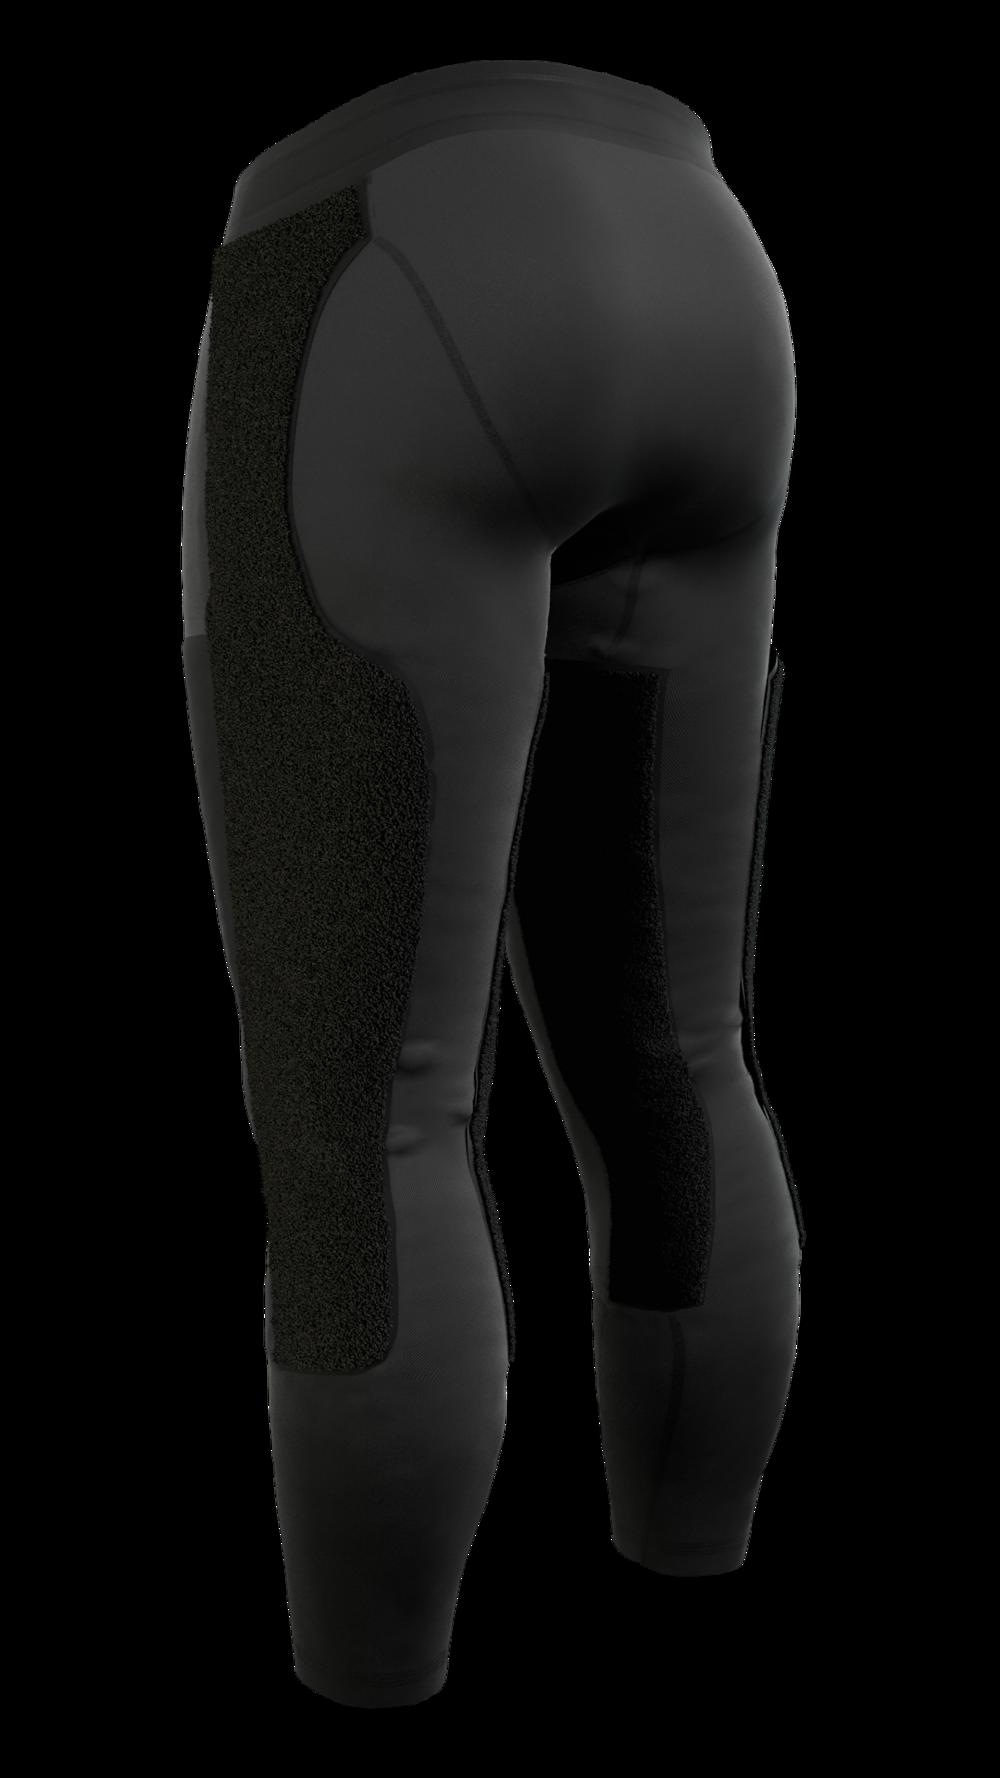 pants4pics5.png